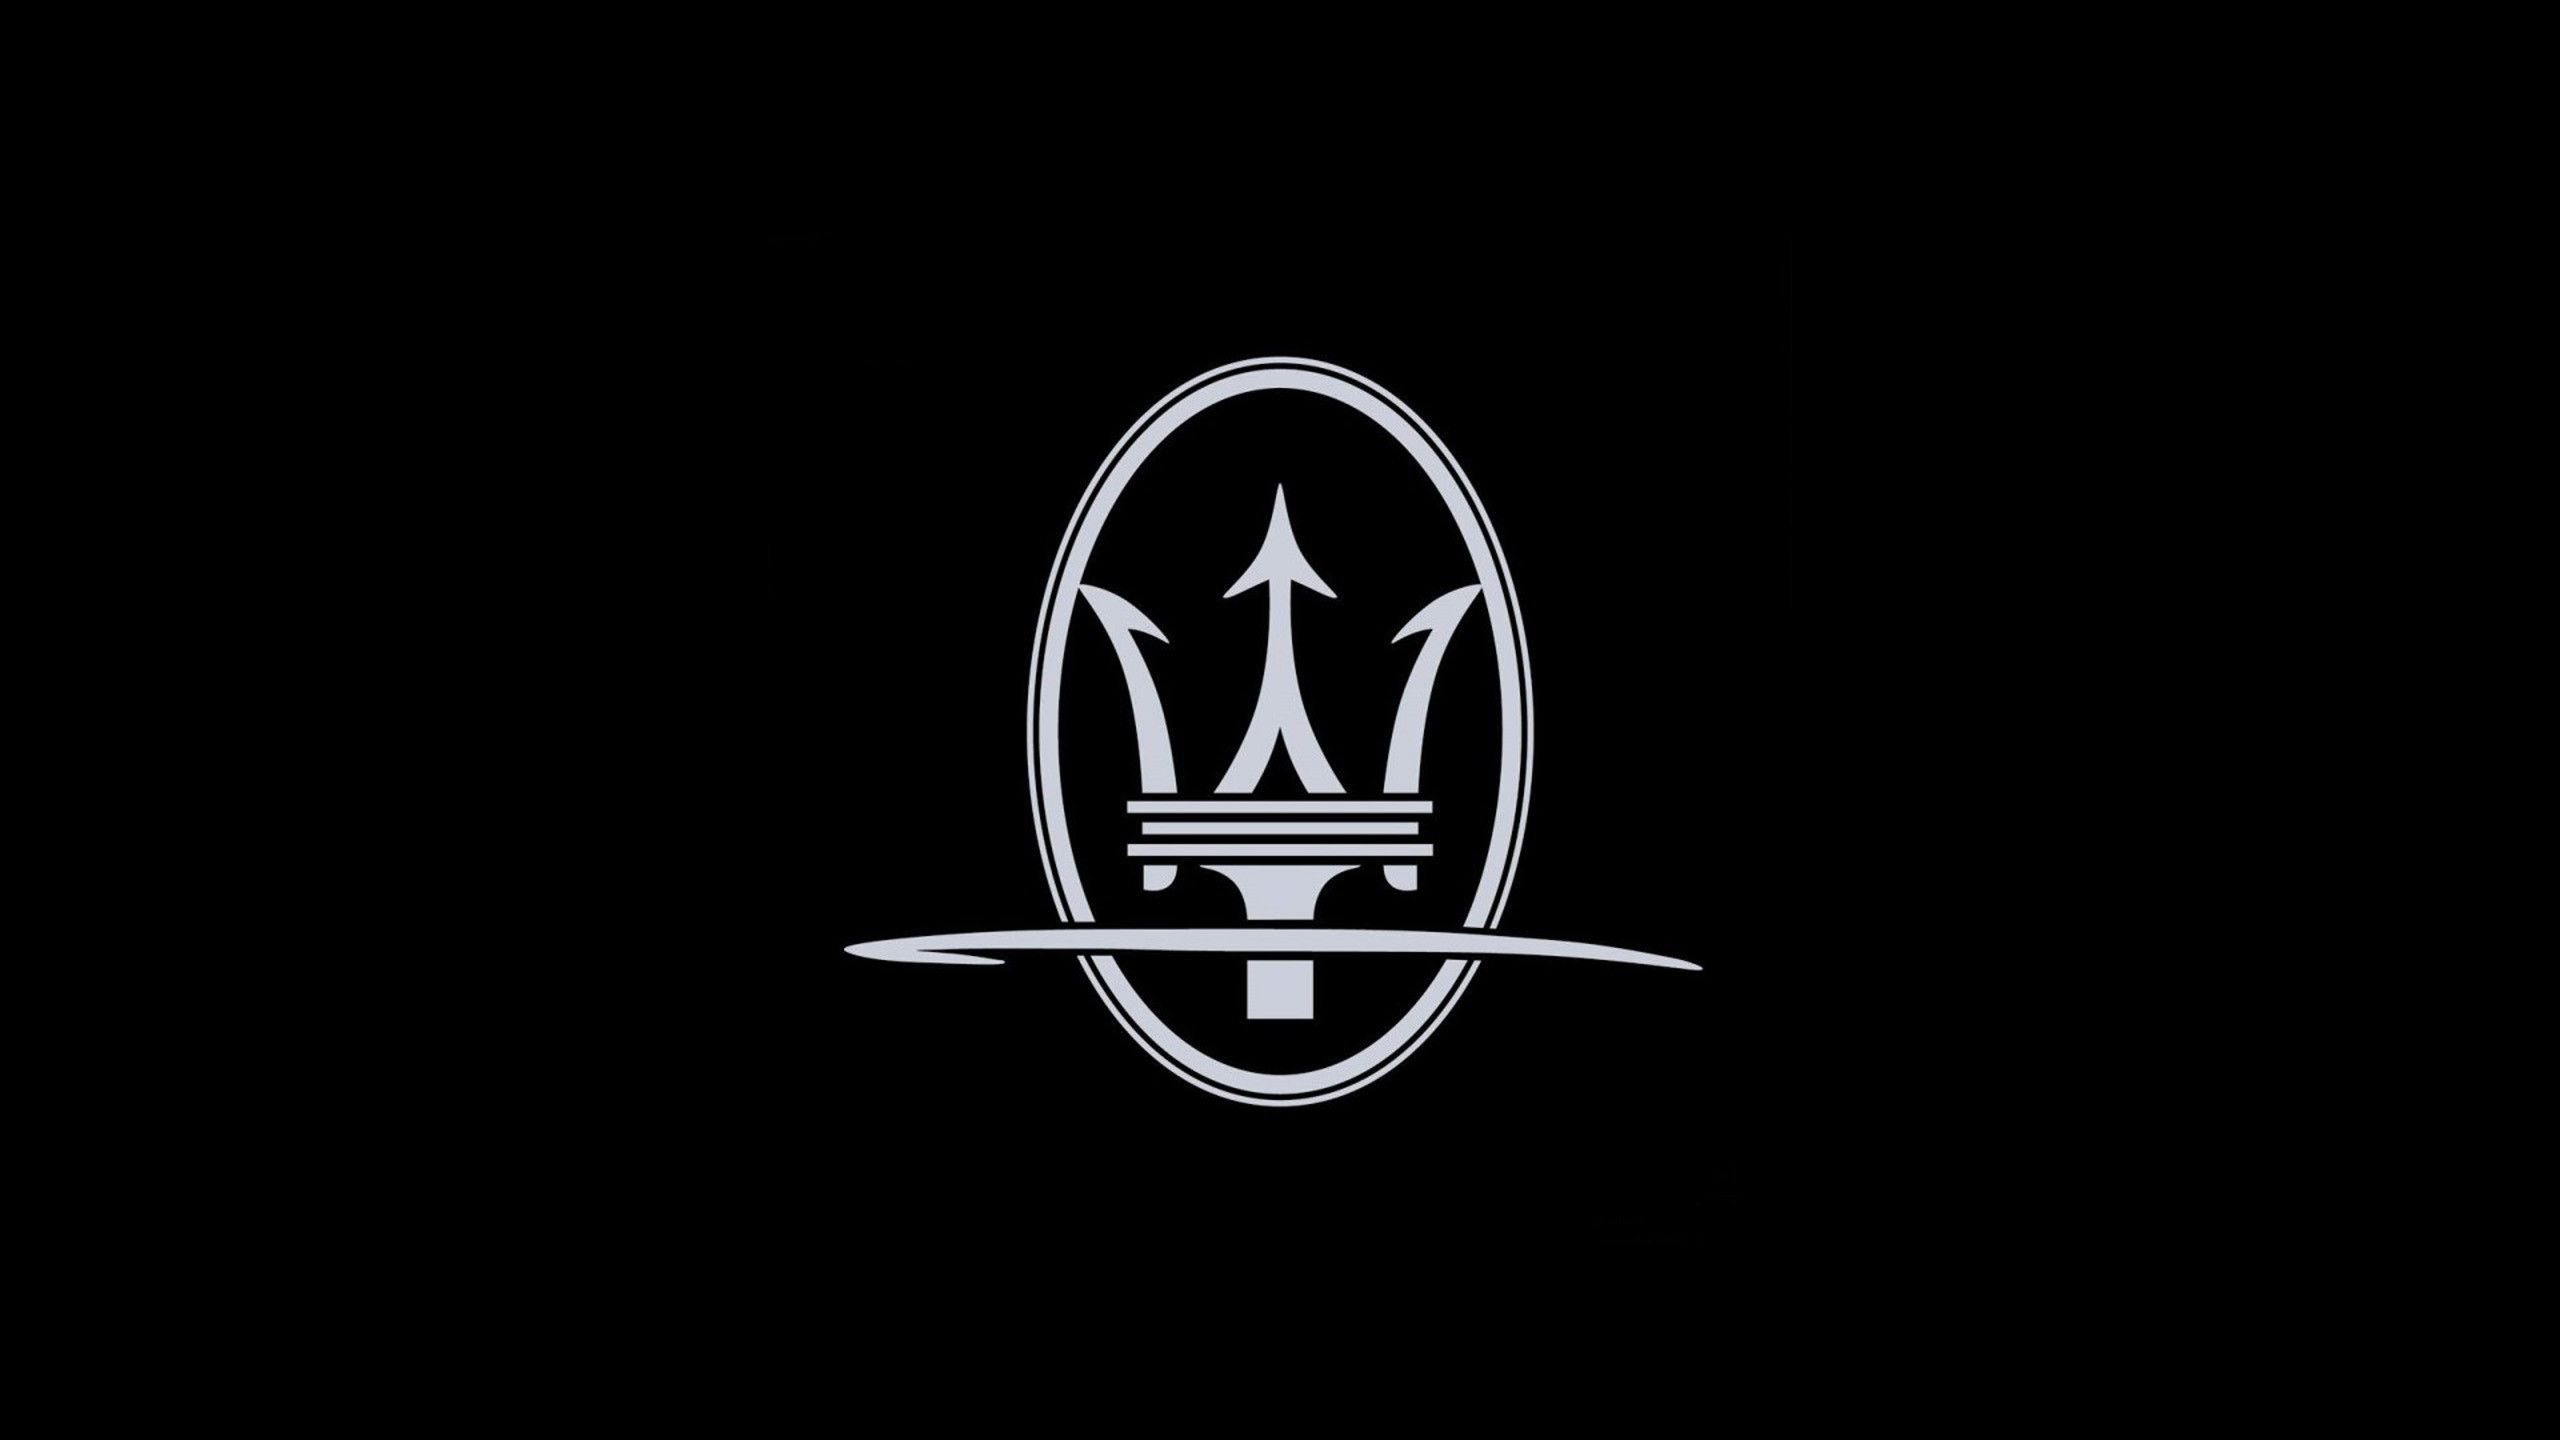 Maserati Logo Wallpapers   Top Maserati Logo Backgrounds 2560x1440